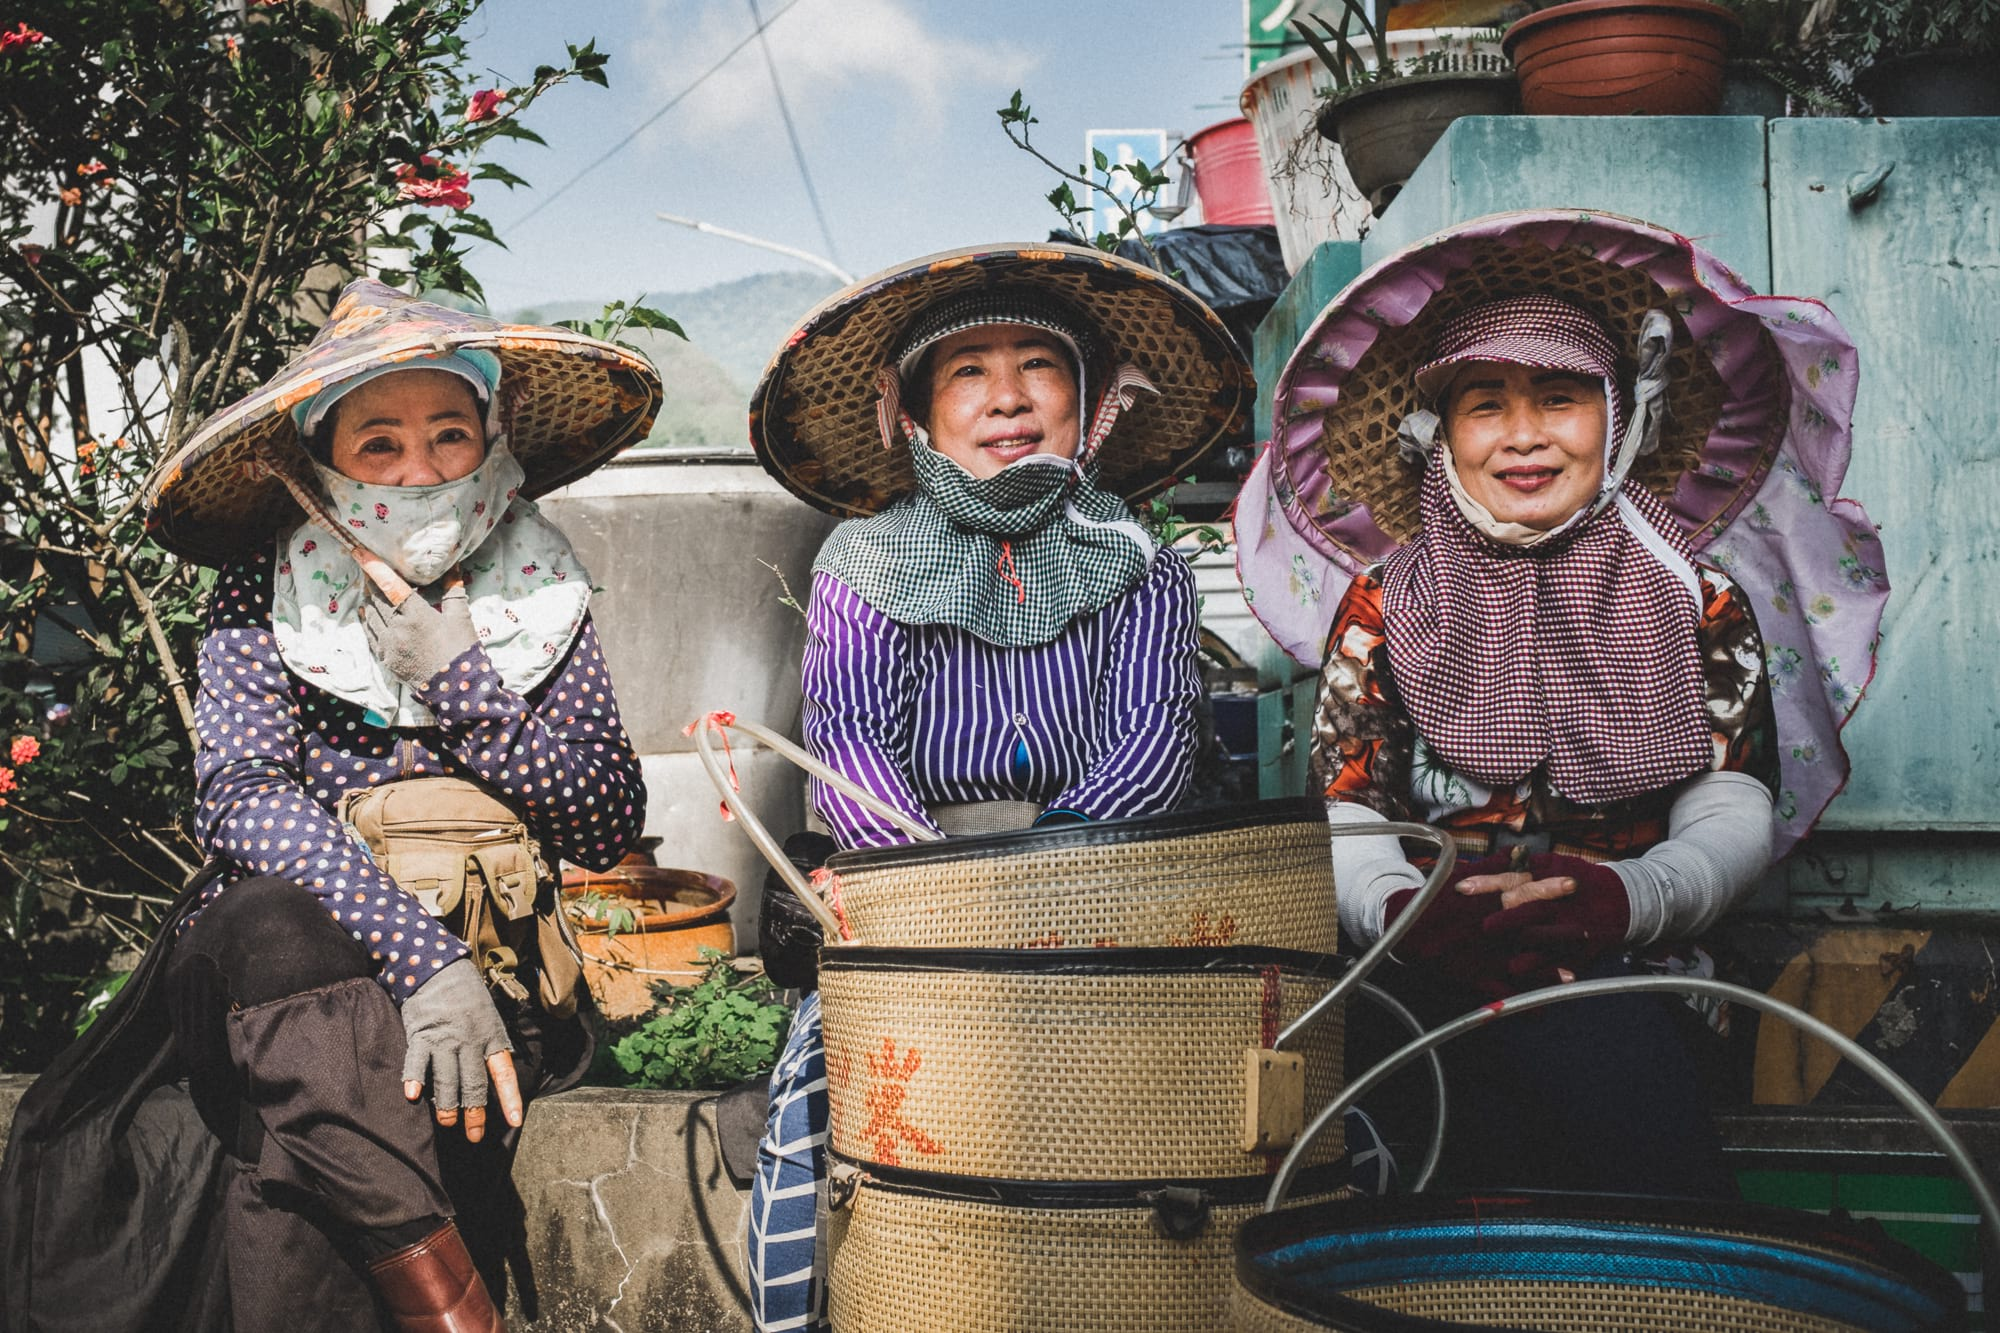 waltsmedia-portrait-taiwan-taipeh-travel-reise-79